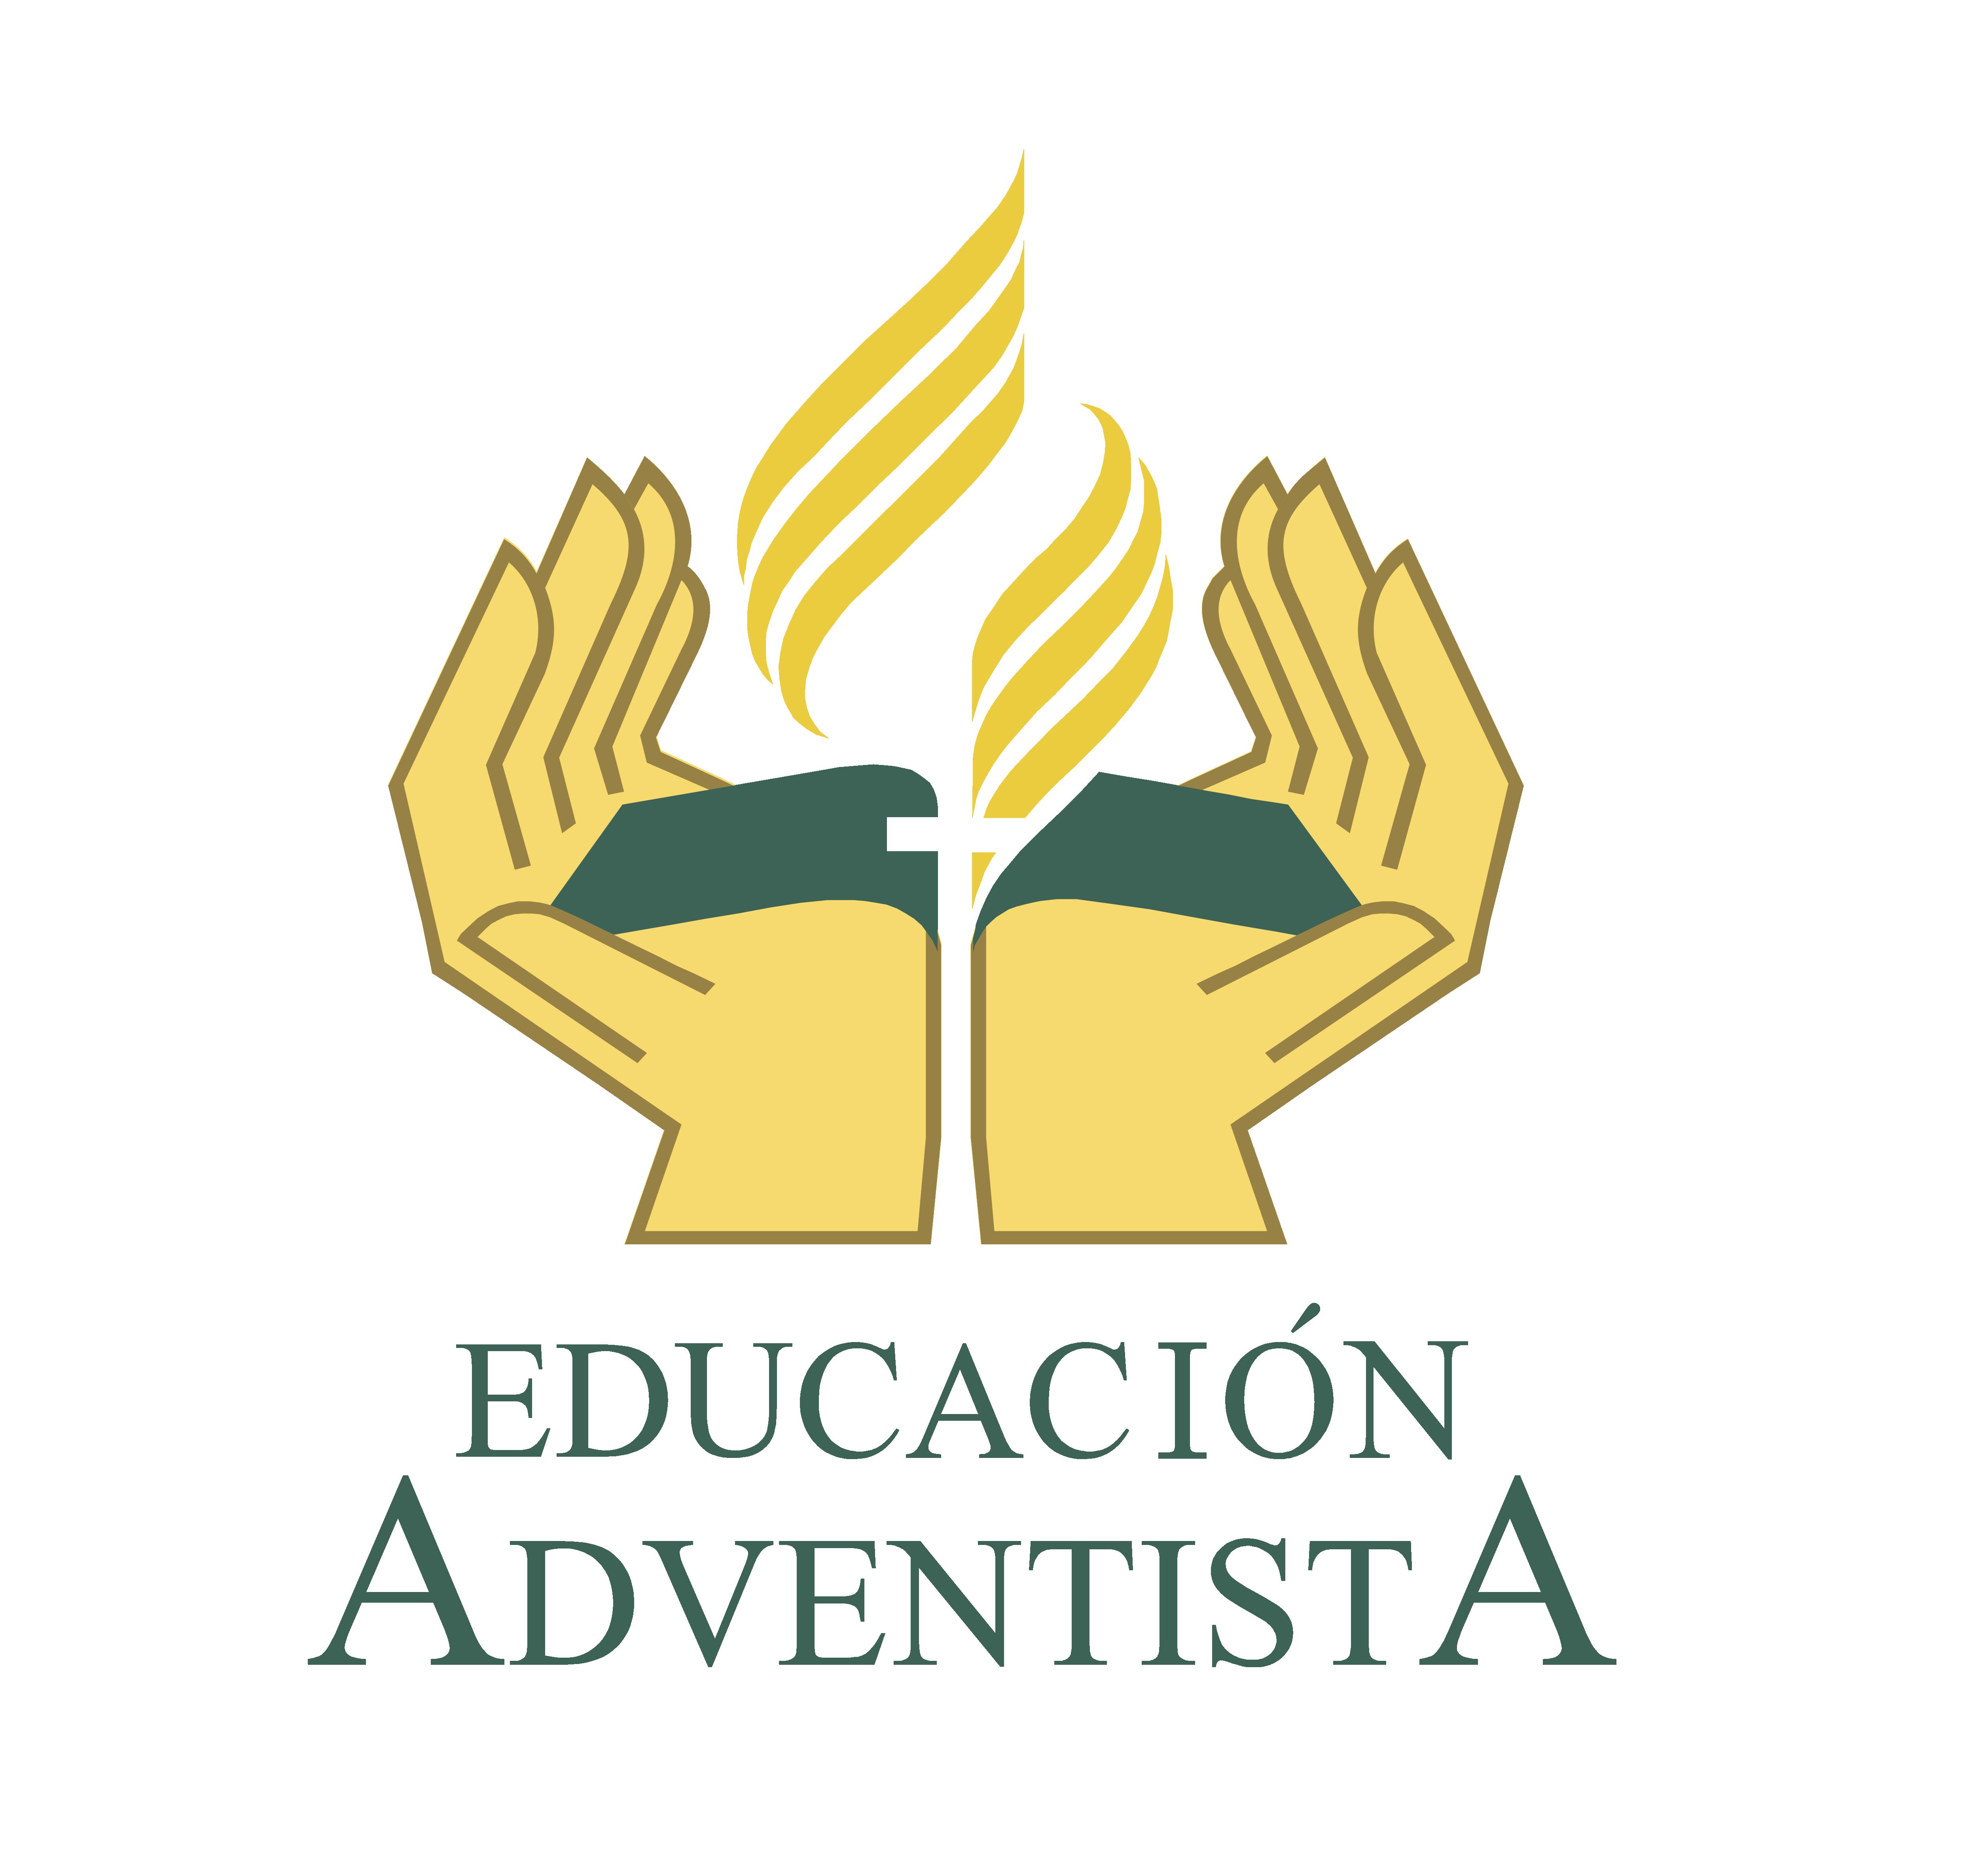 Fluidr   logo educacion adventista png by VICTOR EFLT HOTMAIL.COM 52d4f906c1954